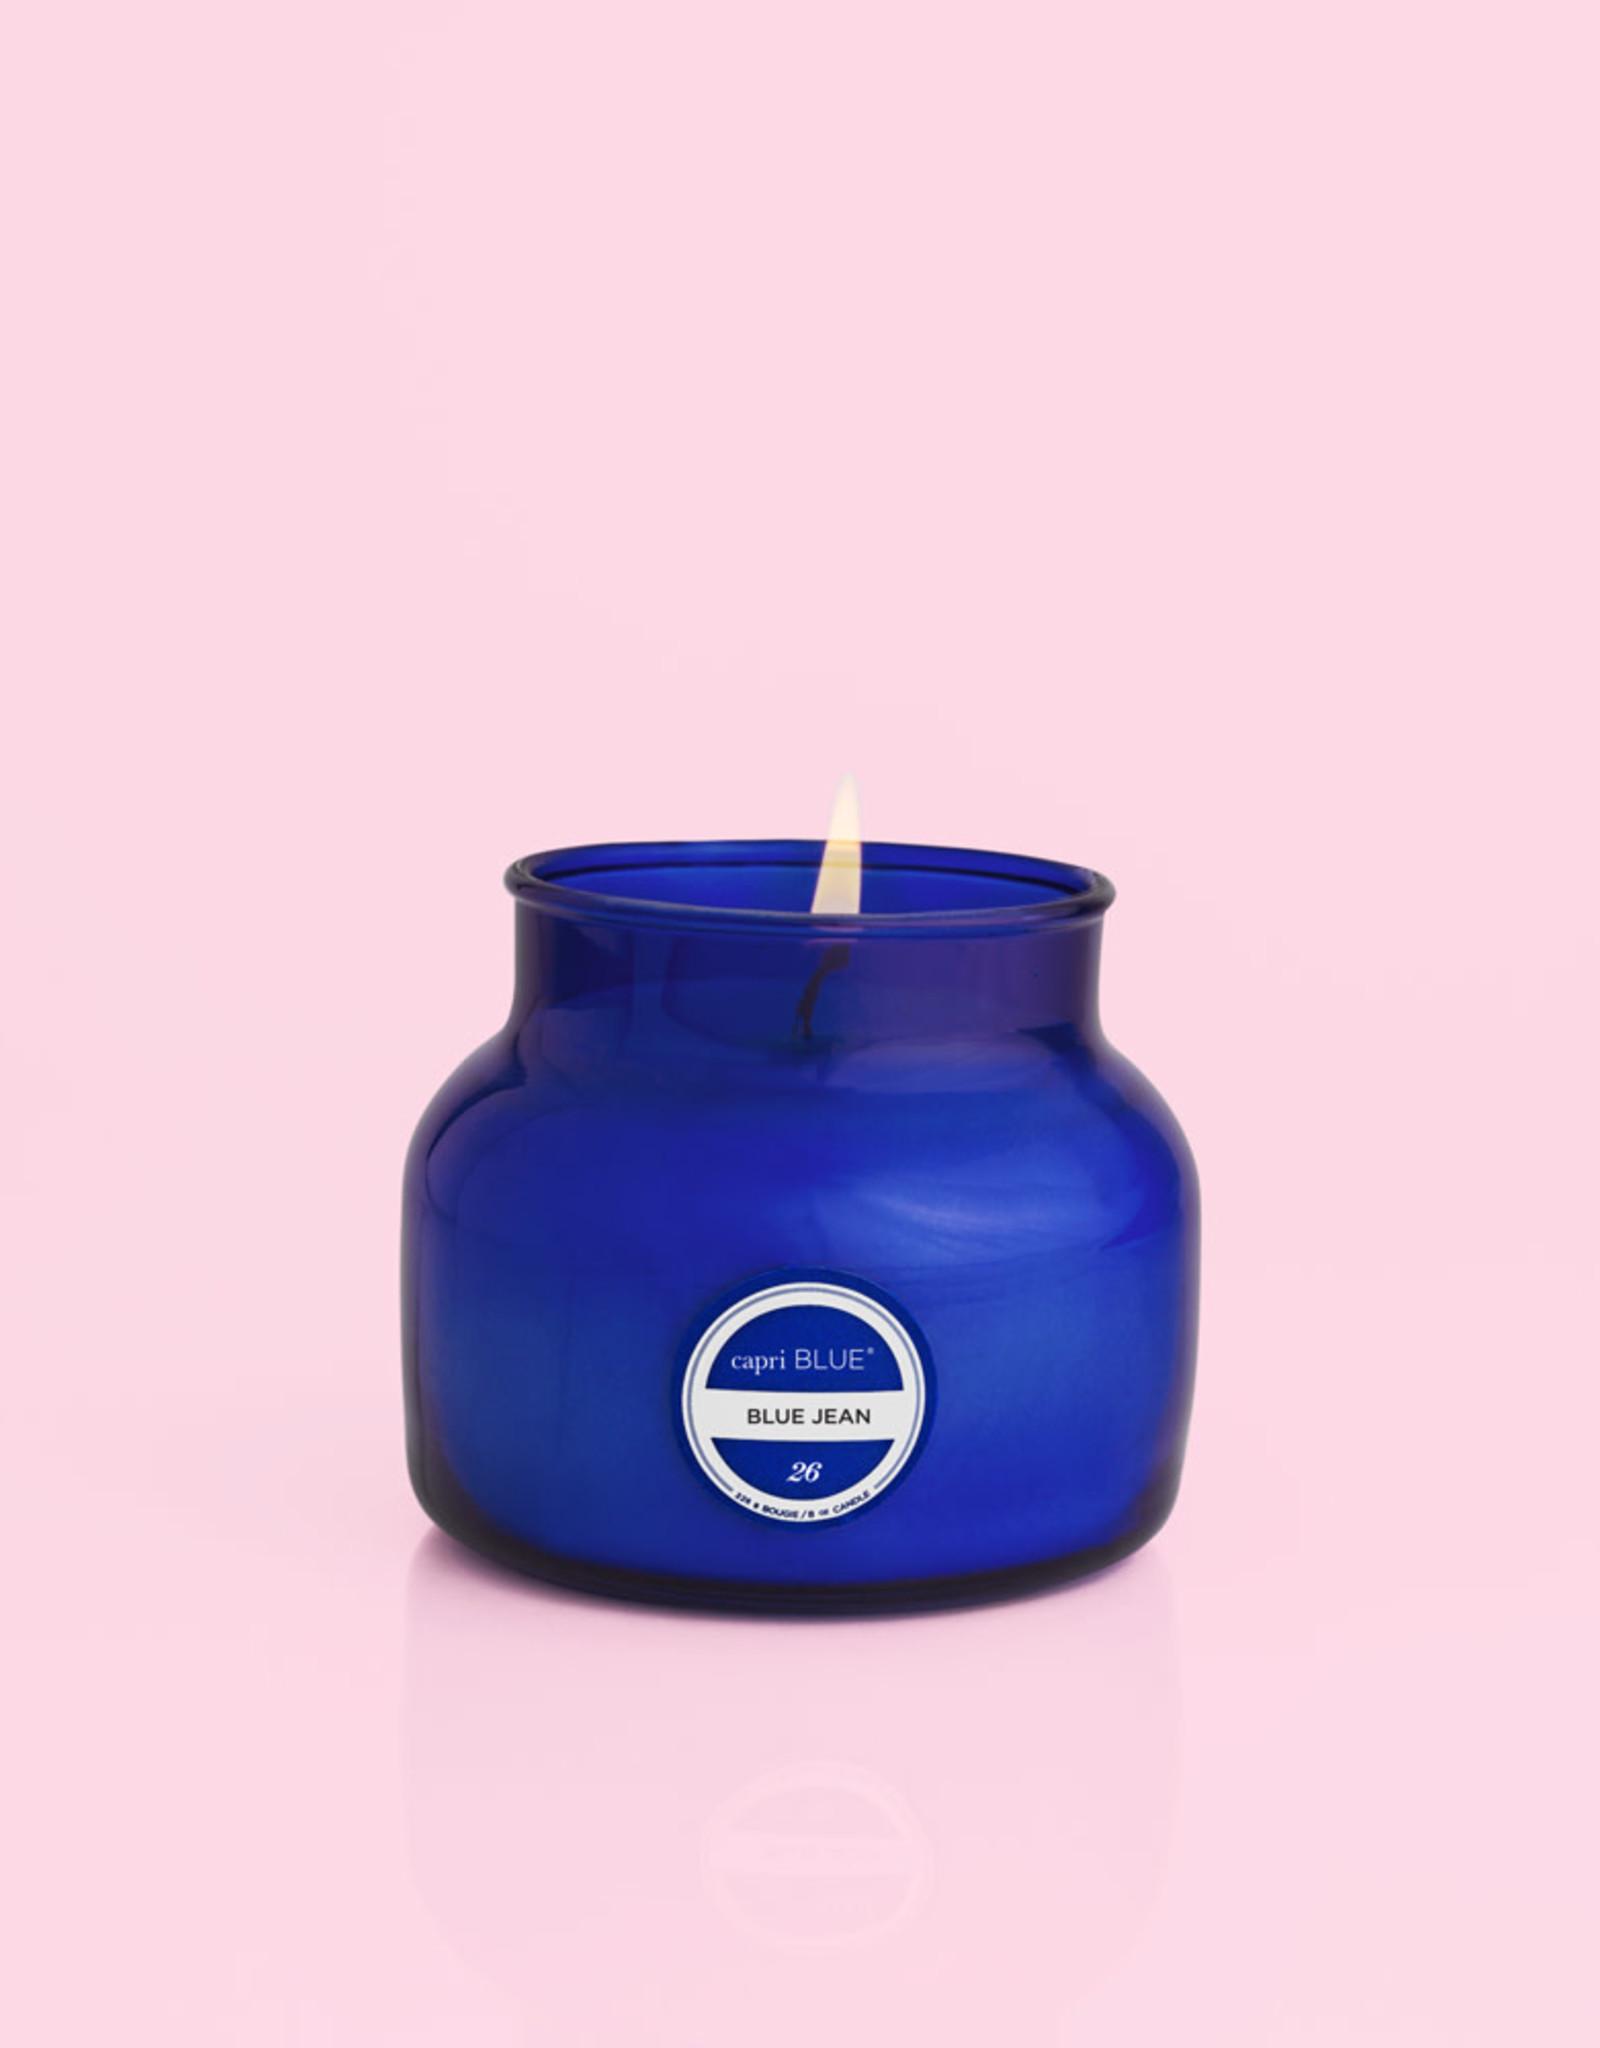 Capri Blue Petite Jar Blue Jean